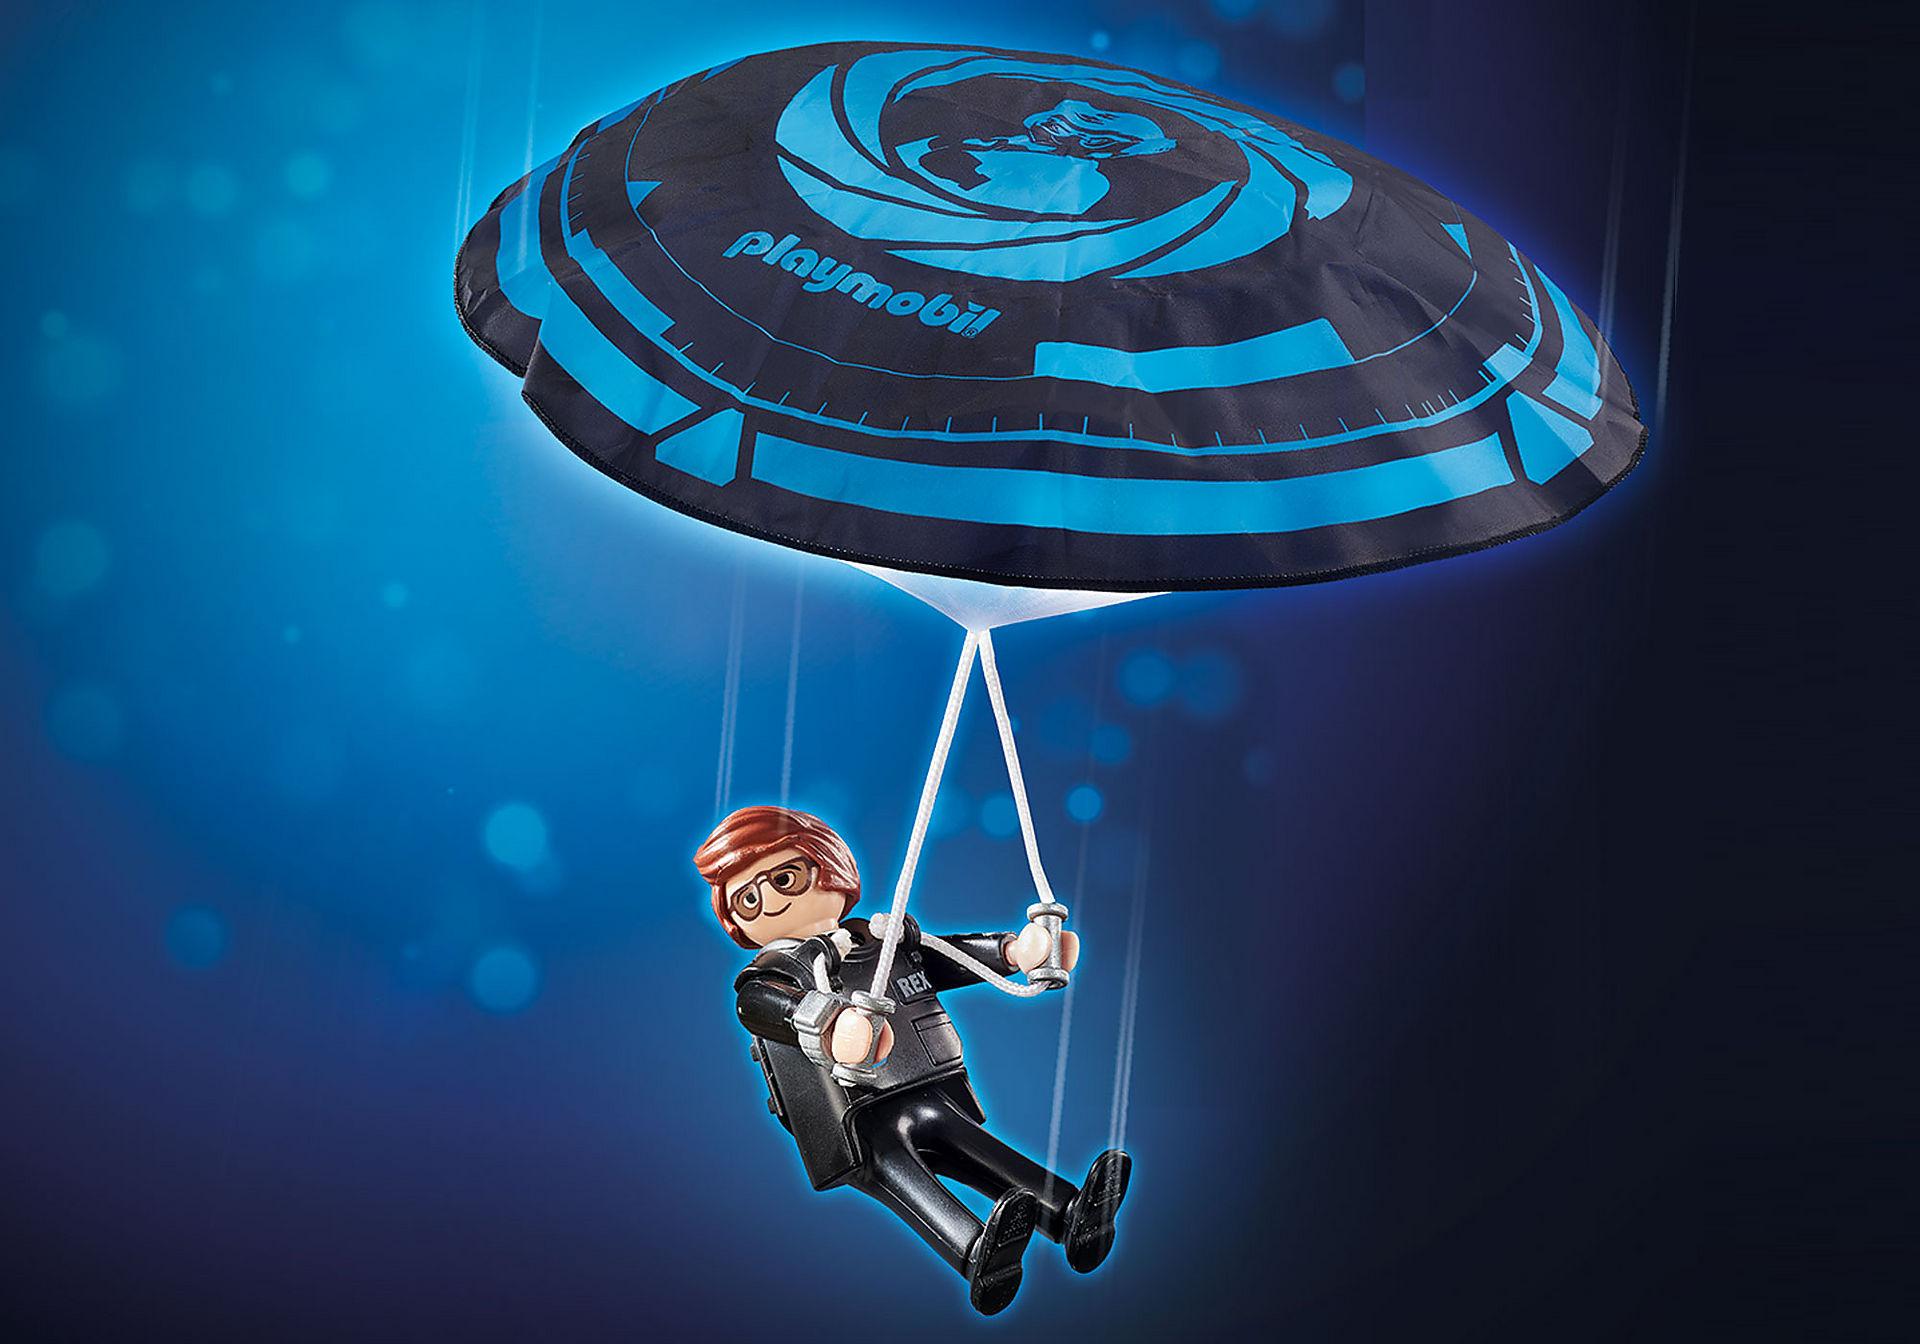 70070 PLAYMOBIL: THE MOVIE Rex Dasher met parachute zoom image1